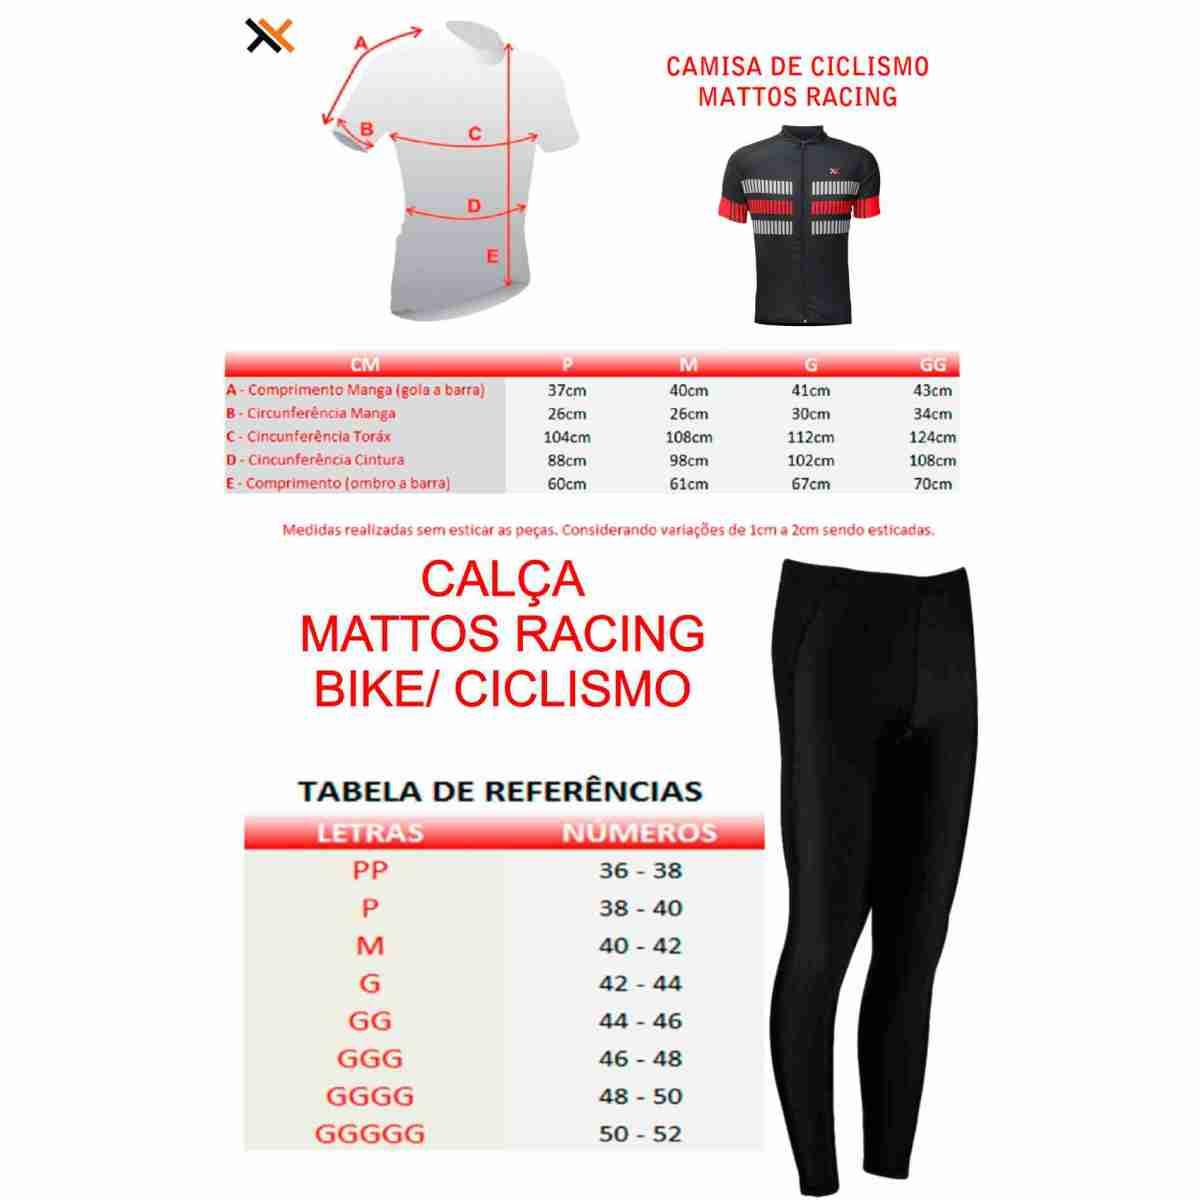 CONJUNTO CICLISMO CAMISA MATTOS RACING BIKE TRACK MTB AZUL + CALÇA FORRO GEL MOUNTAIN BIKE